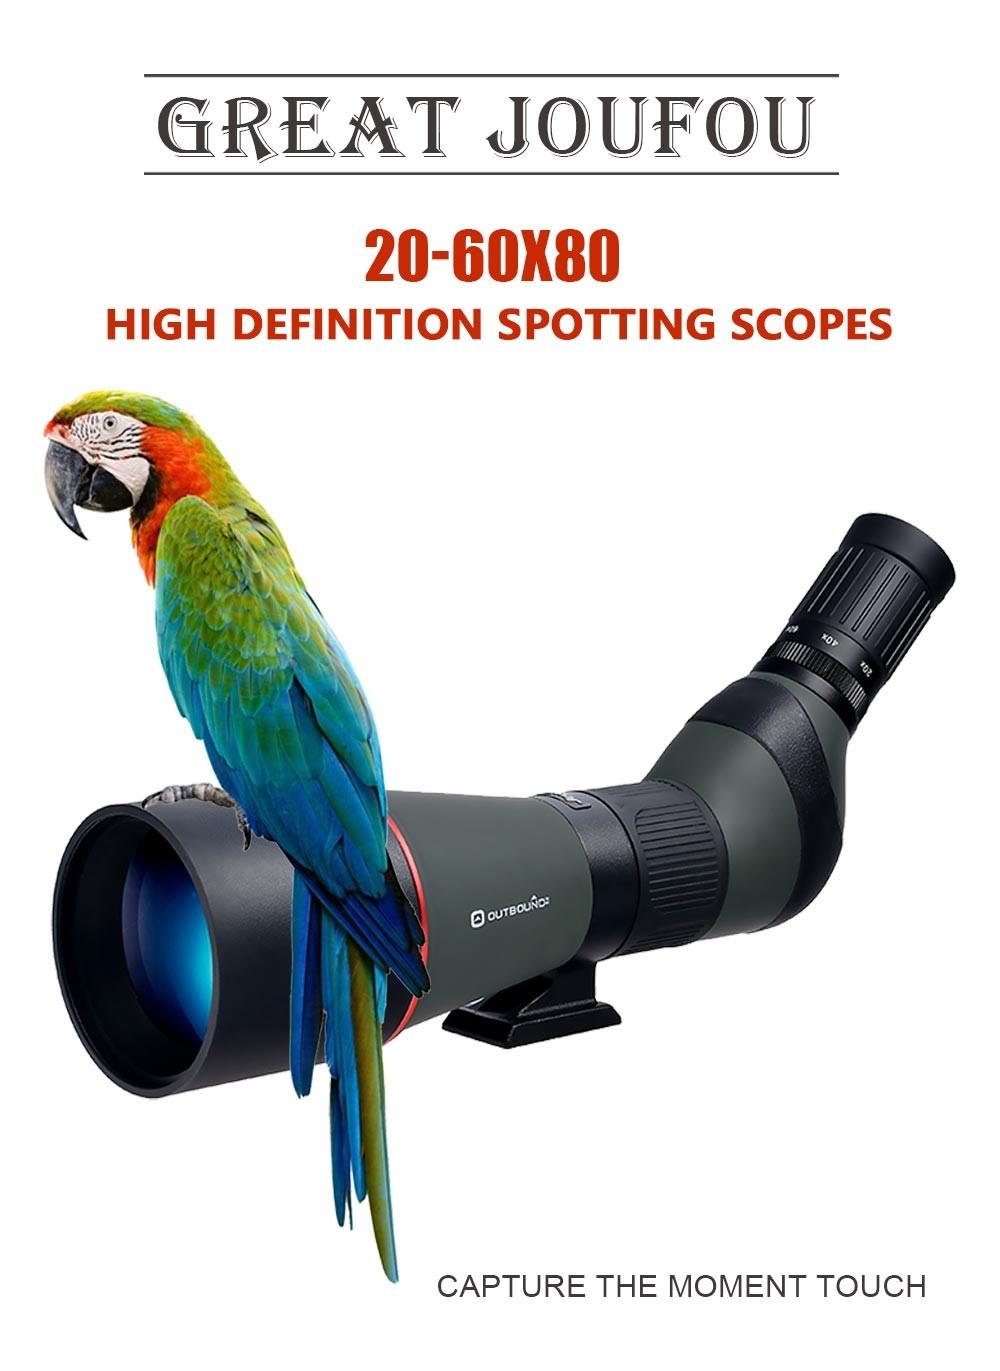 JouFou 20-60X80 HD Spotting Scope Waterproof Zoom Target Shooting Optical Glass High Power with Tripod Birdwatching (1)